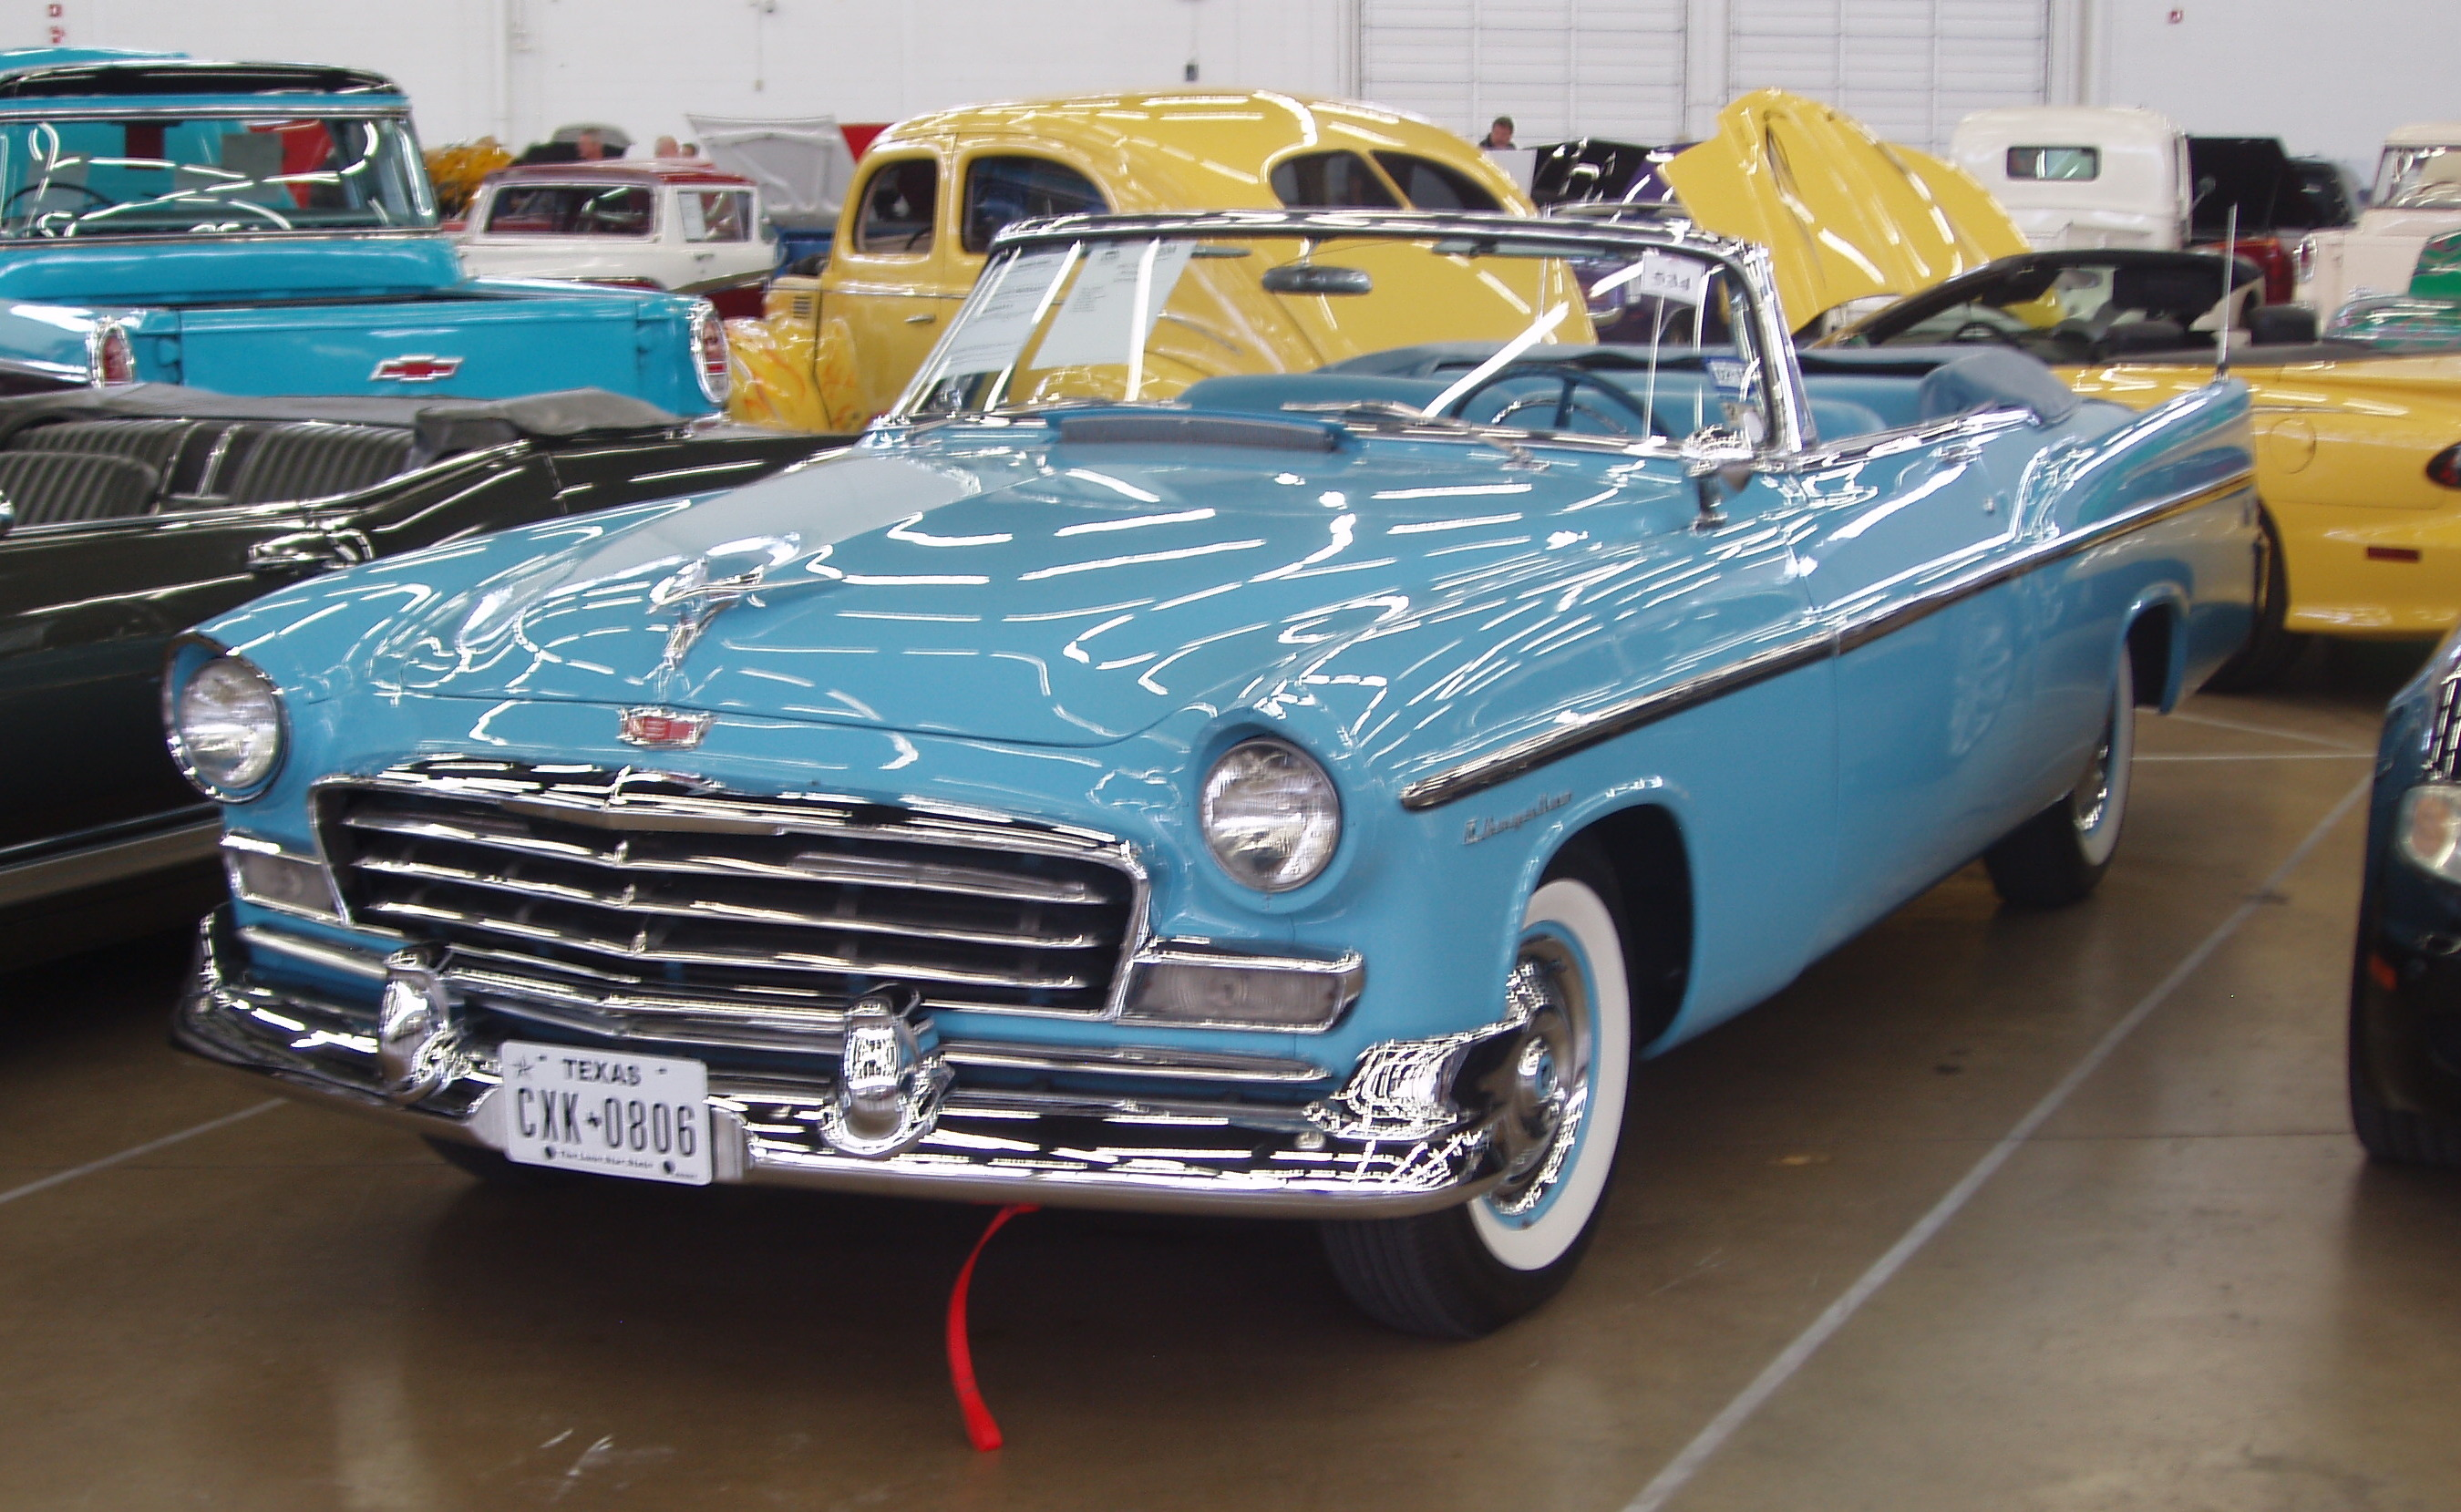 Chrysler New Yorker IV 1955 - 1956 Coupe-Hardtop #3